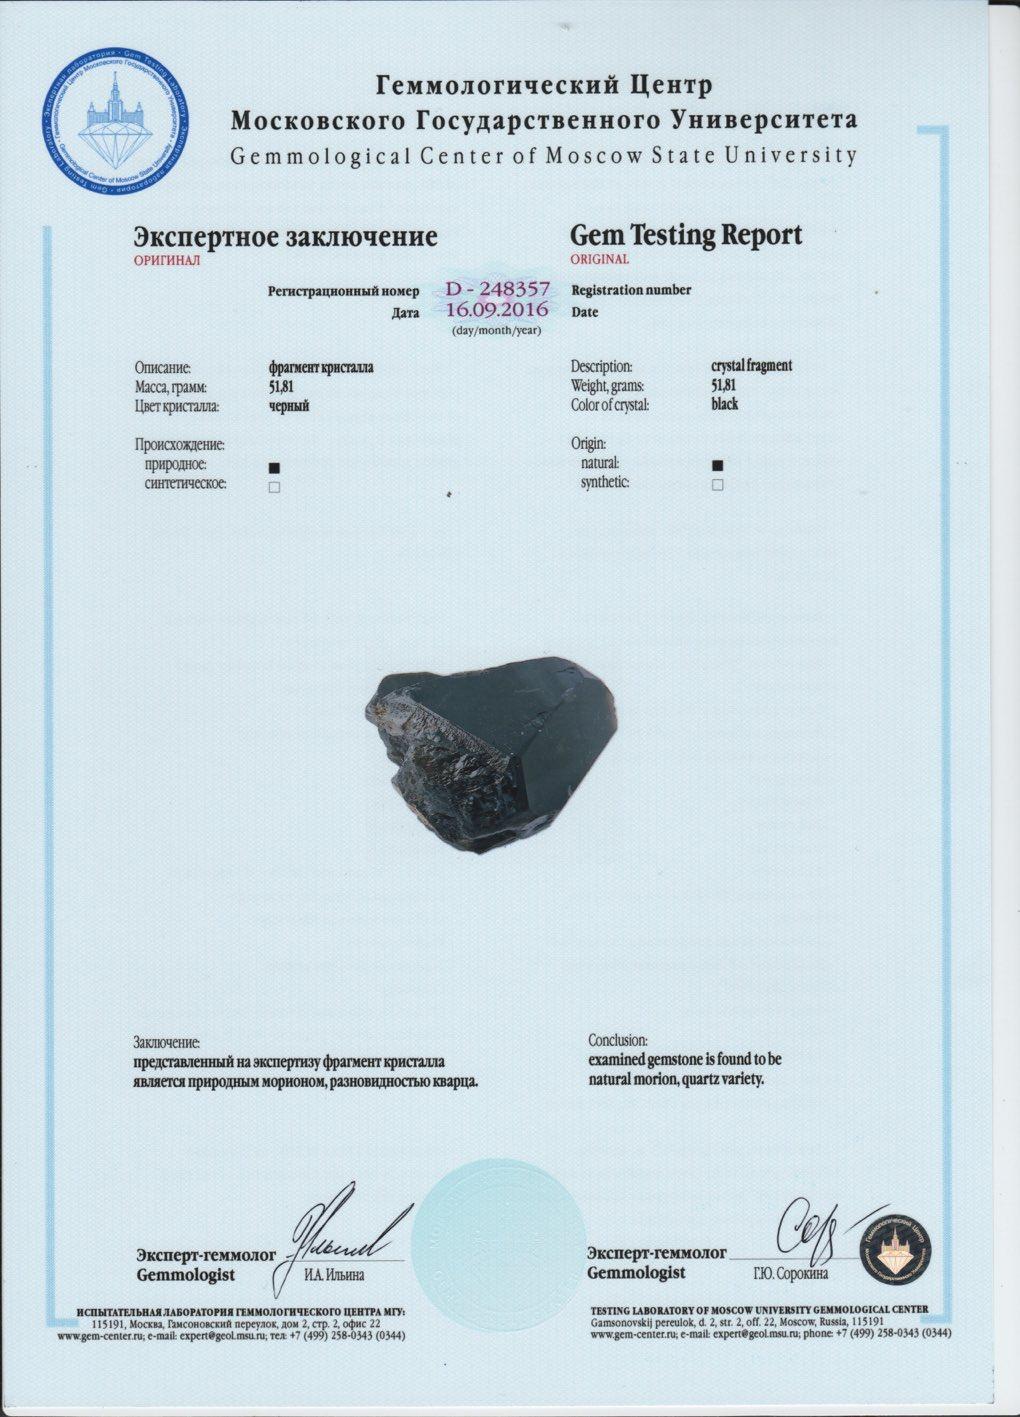 https://mineralmarket.ru/img/certificate/57/1485963926.jpeg